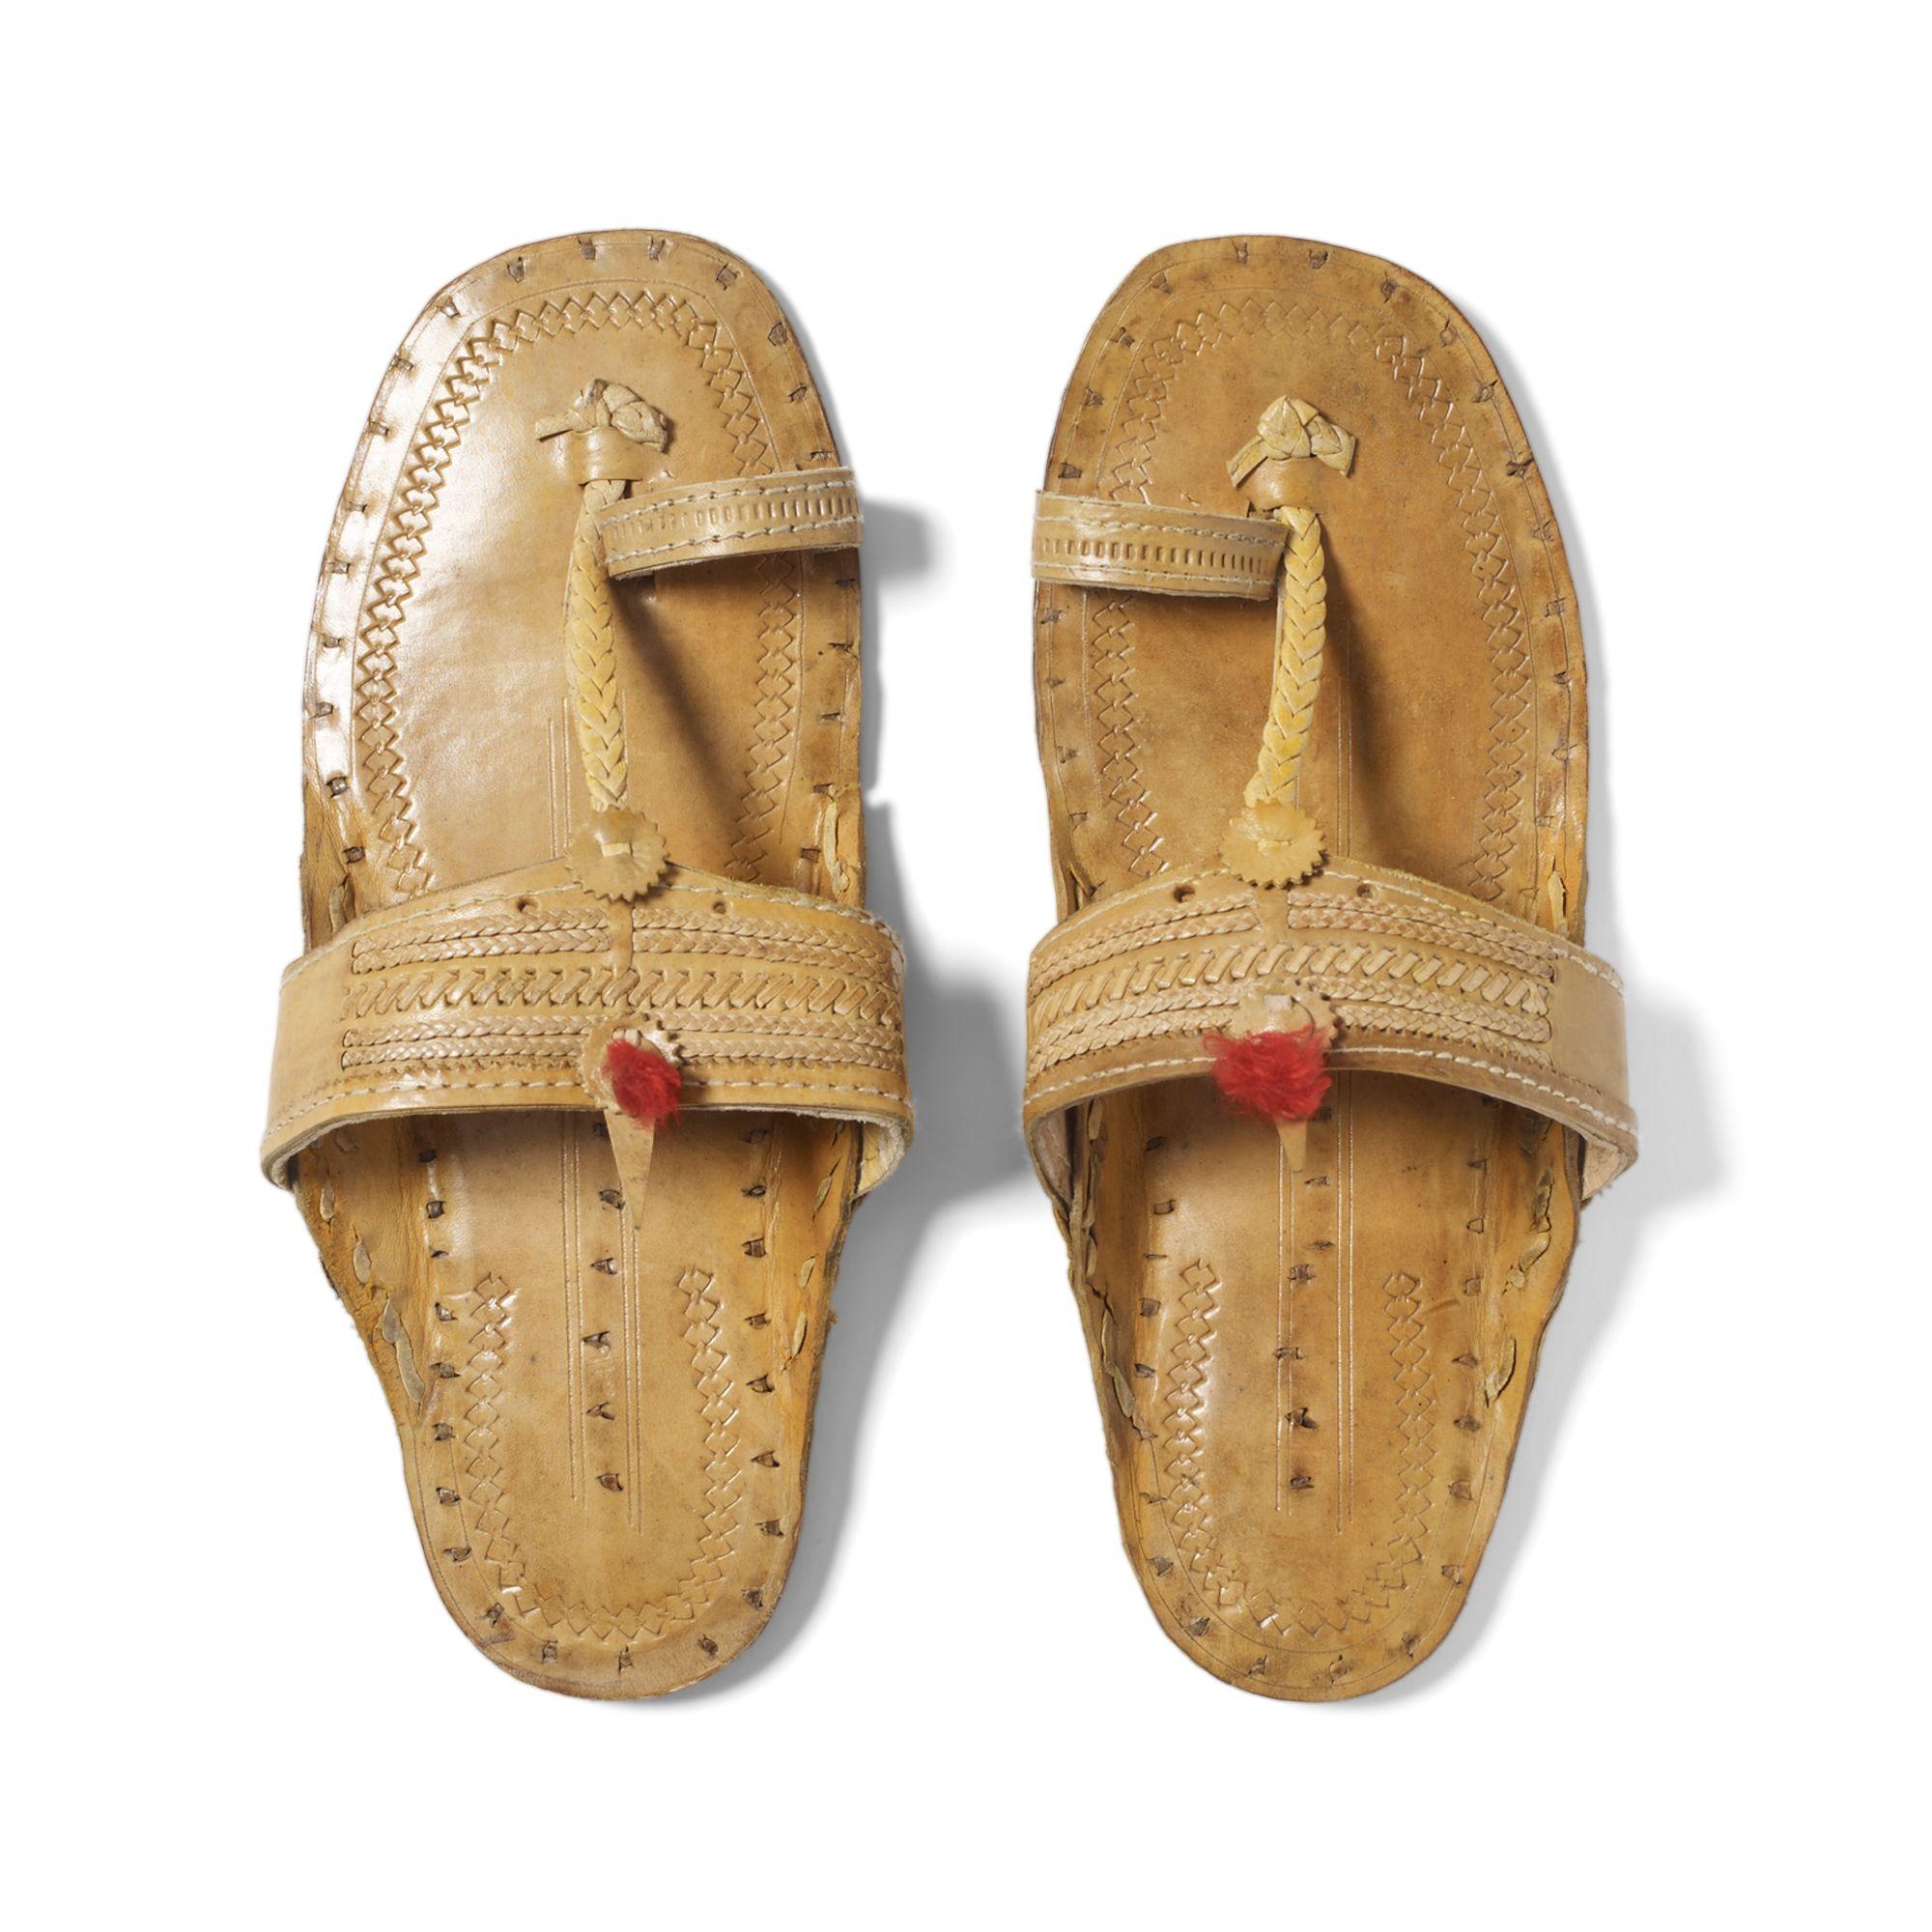 482b382afdd4 Lyst - Club Monaco Indian Sandals in Natural